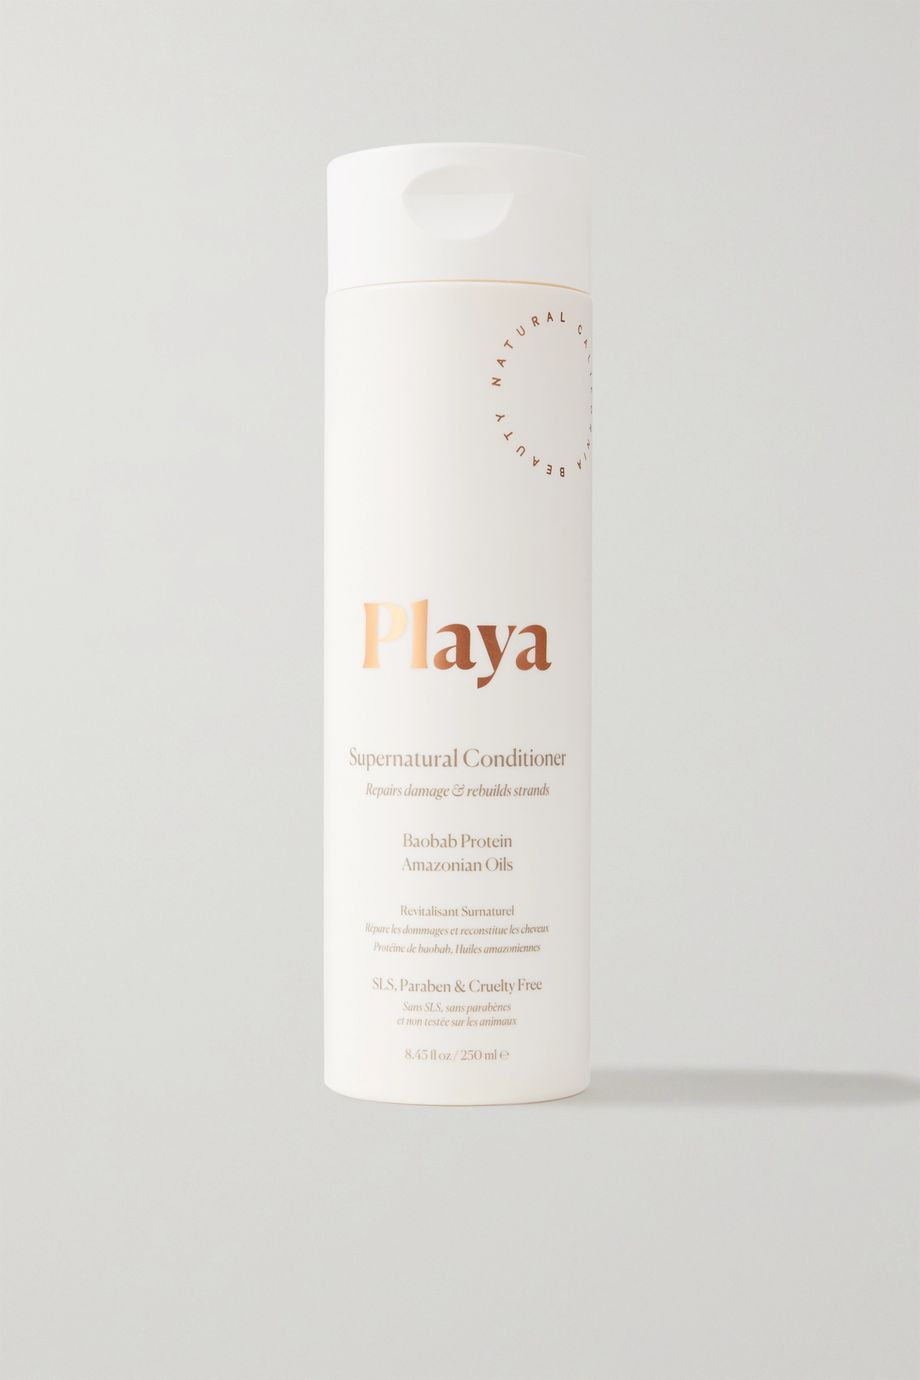 Playa Beauty Supernatural Conditioner, 250ml